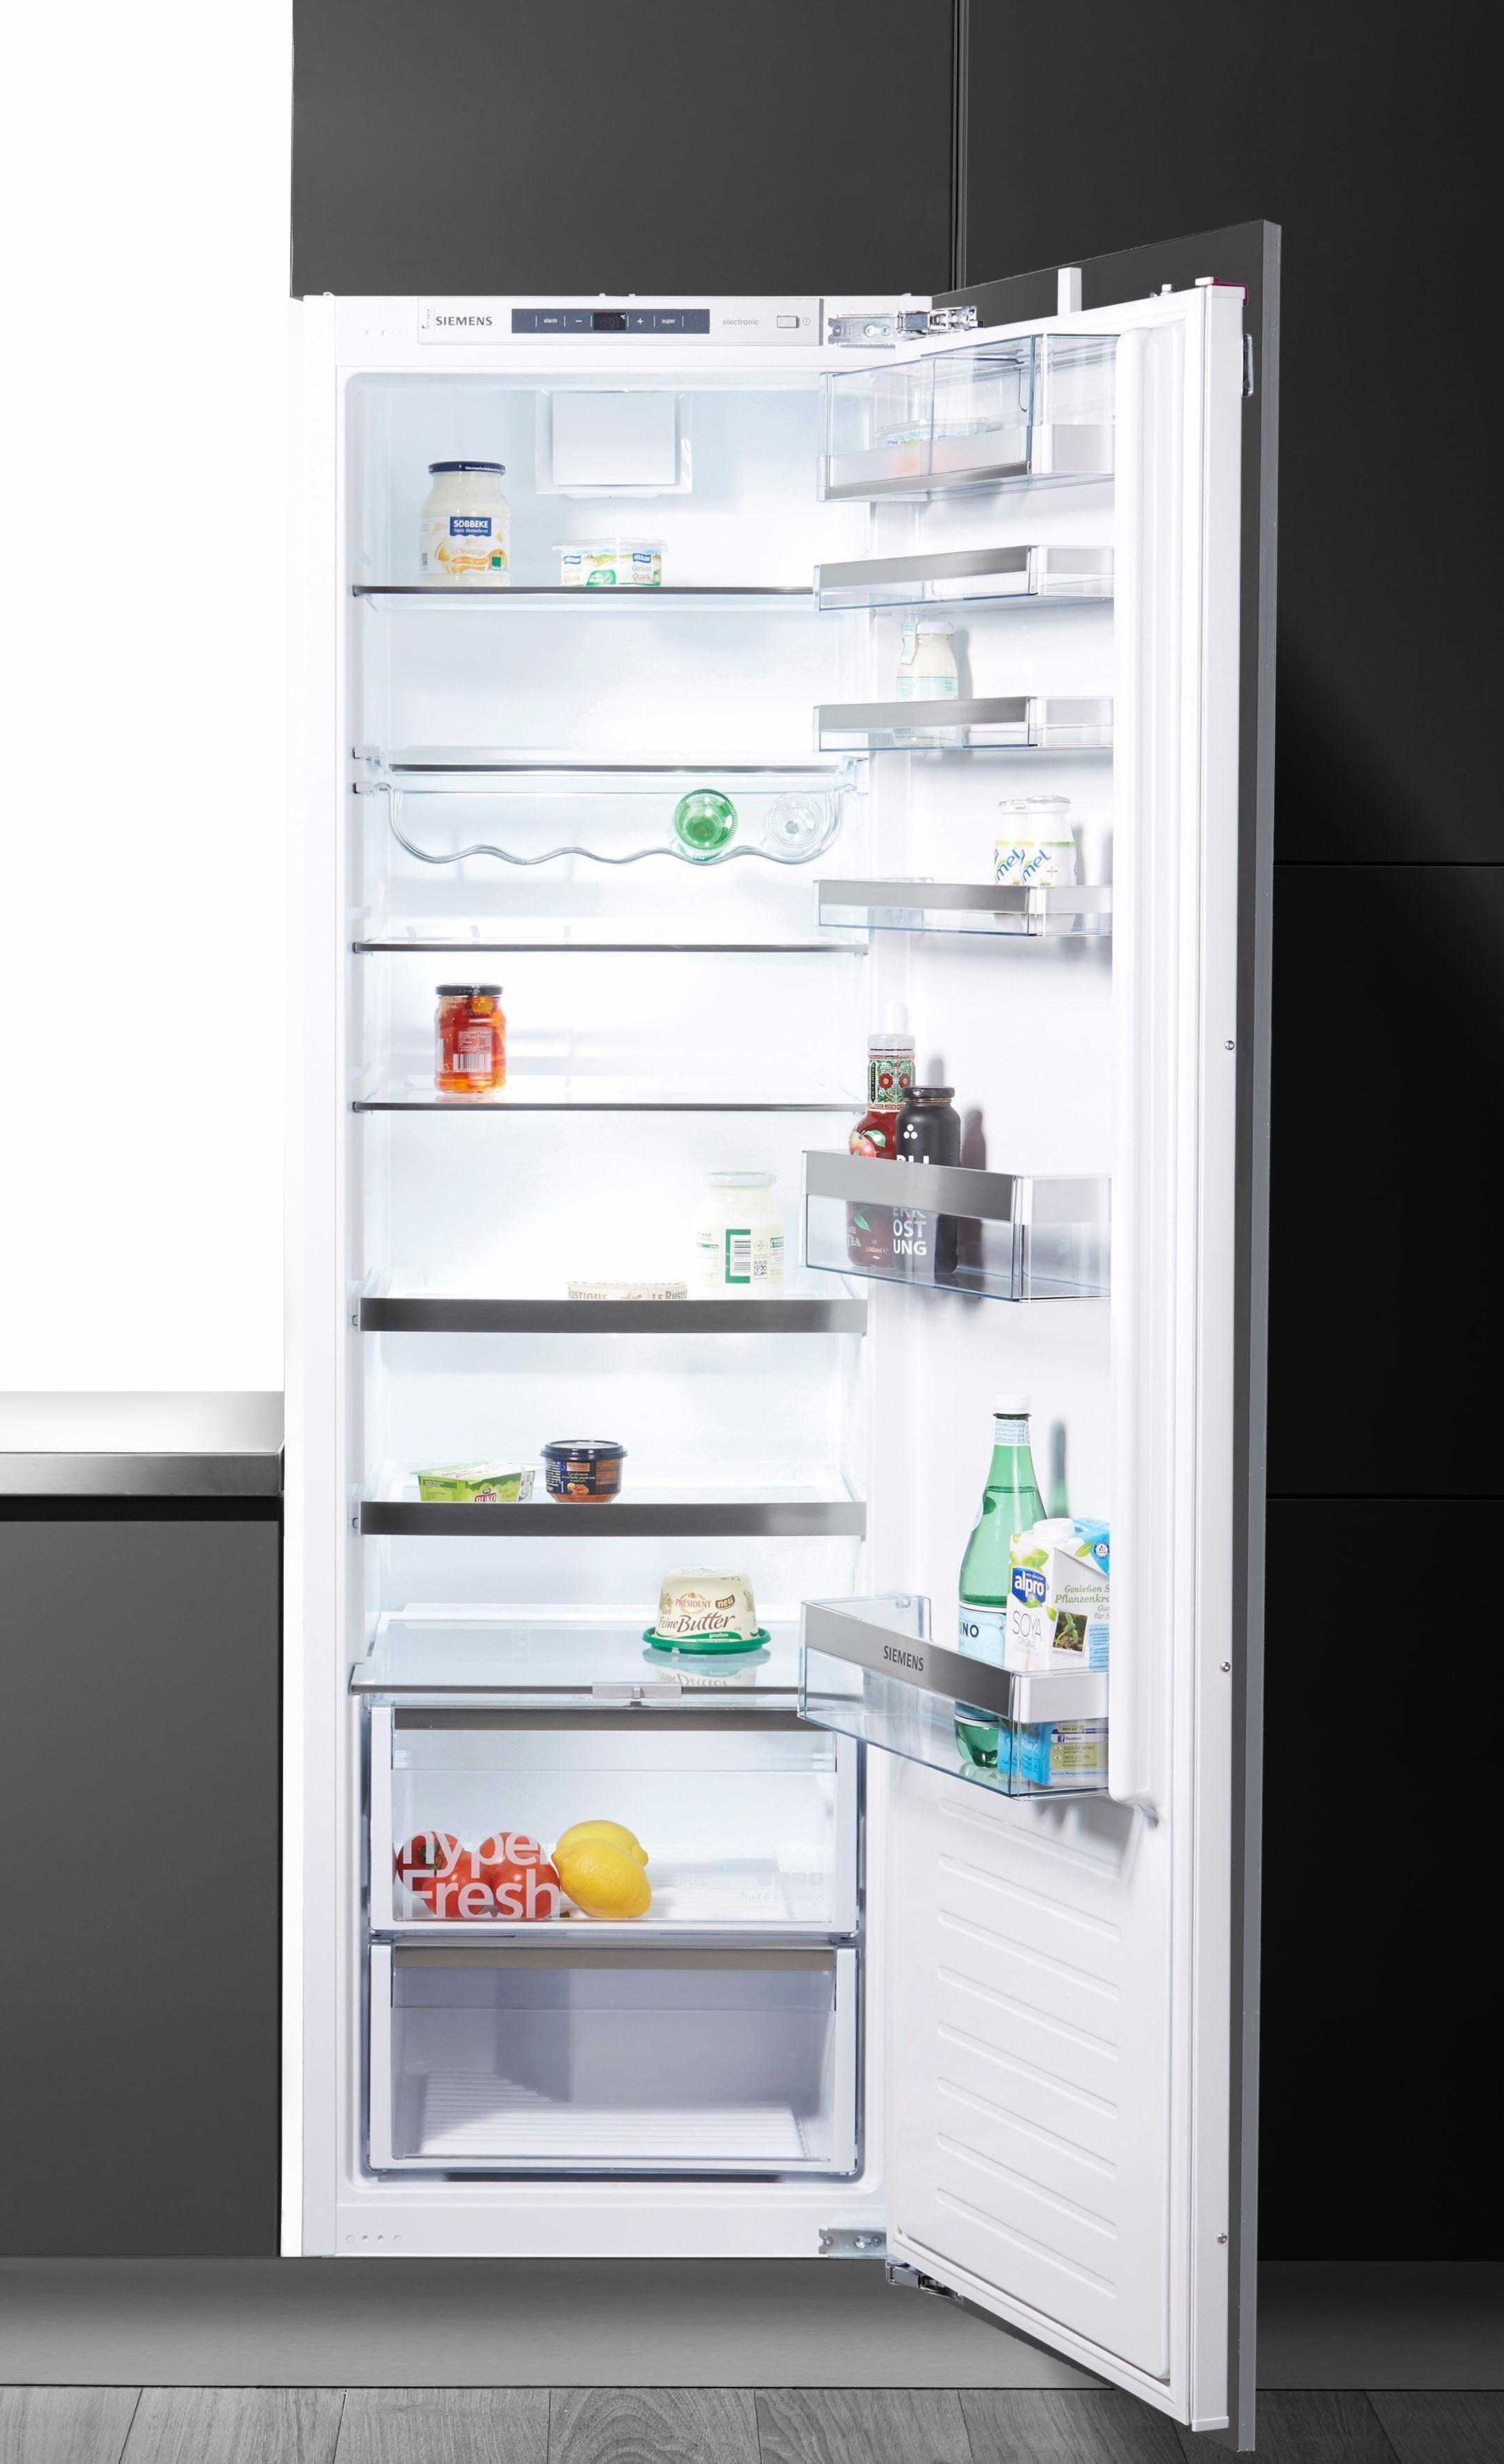 Siemens Einbau-Kühlautomat KI81RAD30, Energieklasse A++, 177,2 cm hoch